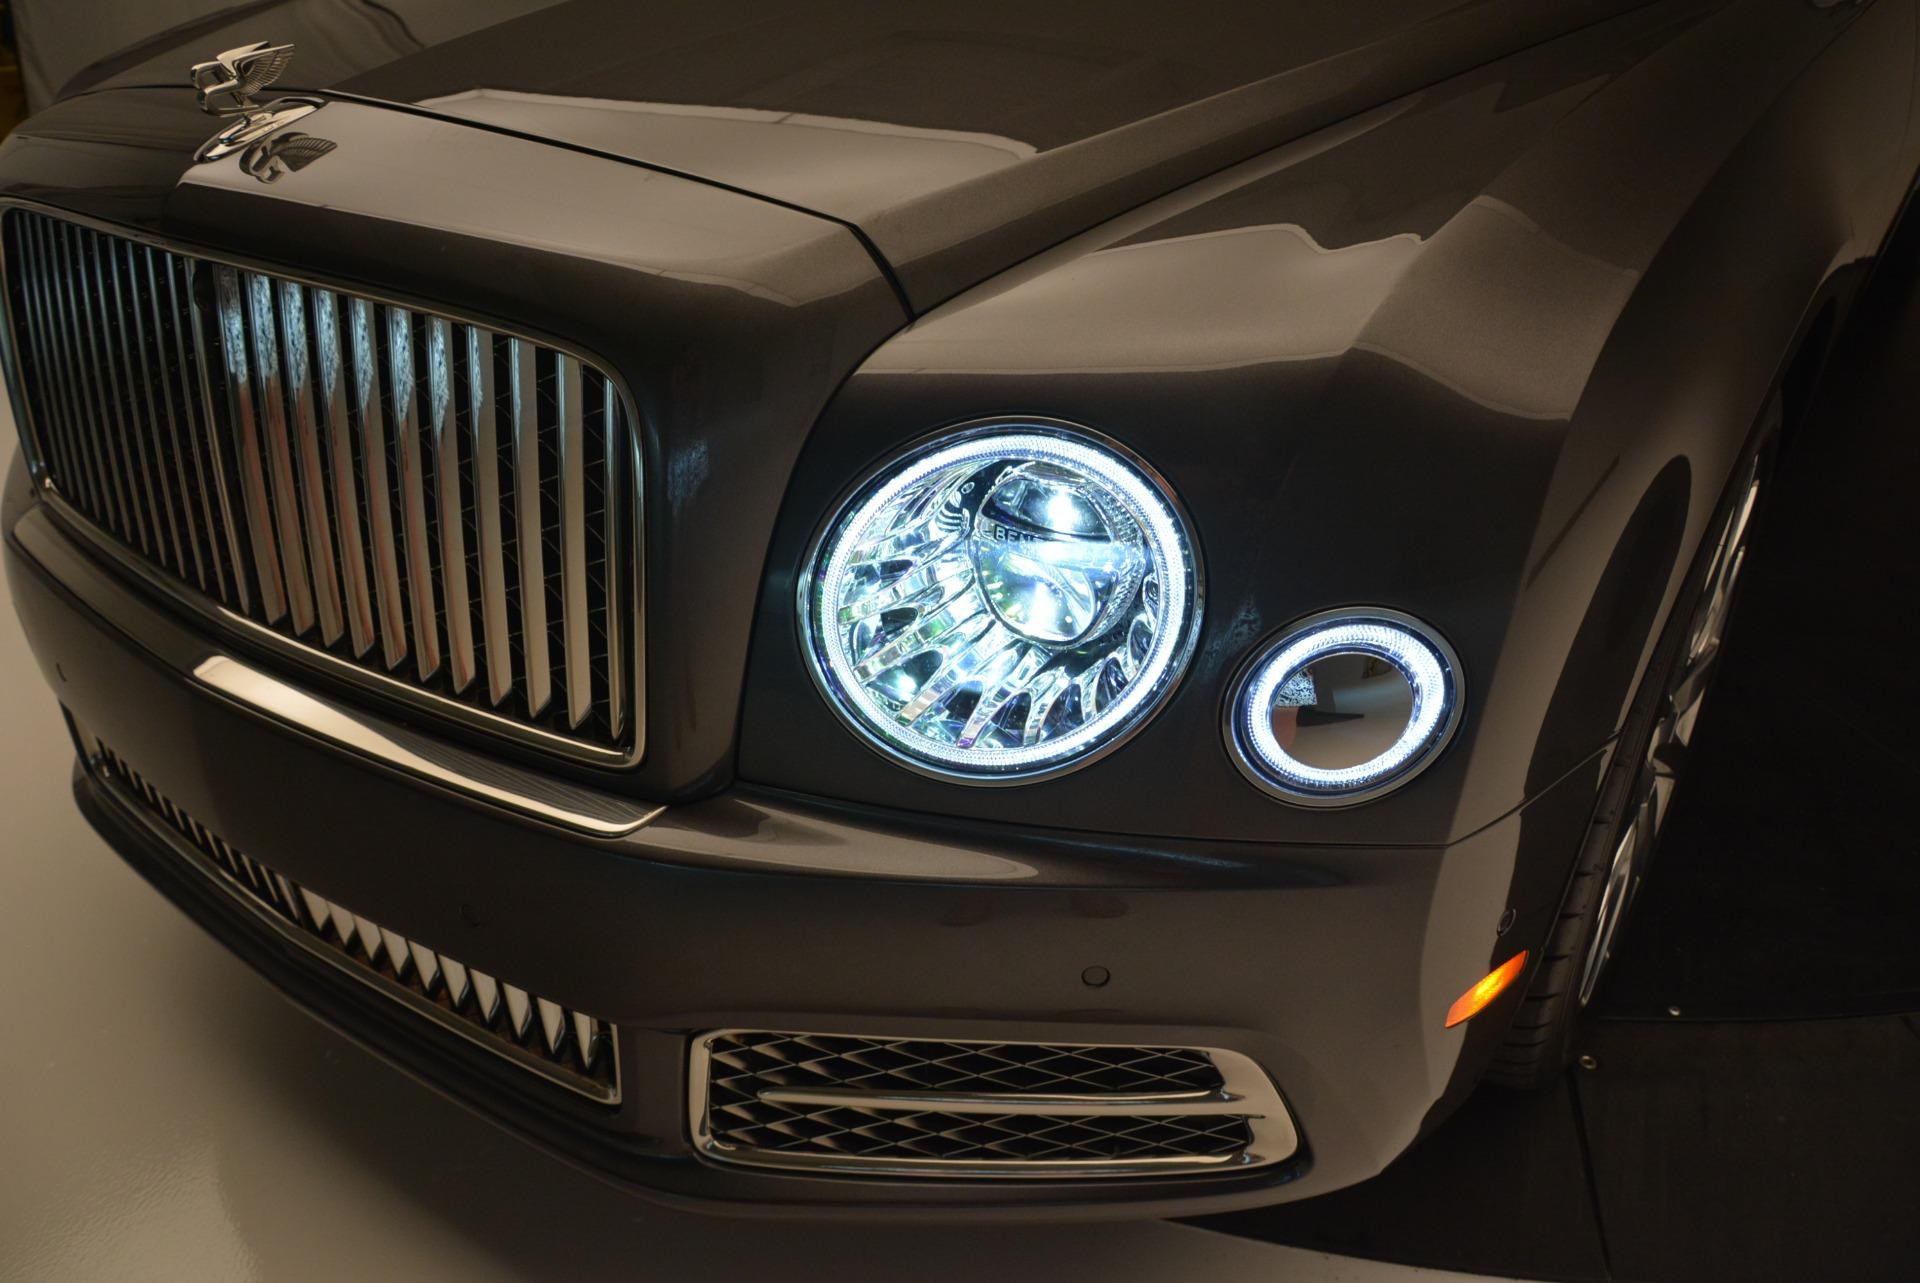 Used 2017 Bentley Mulsanne EWB For Sale In Greenwich, CT 1554_p5